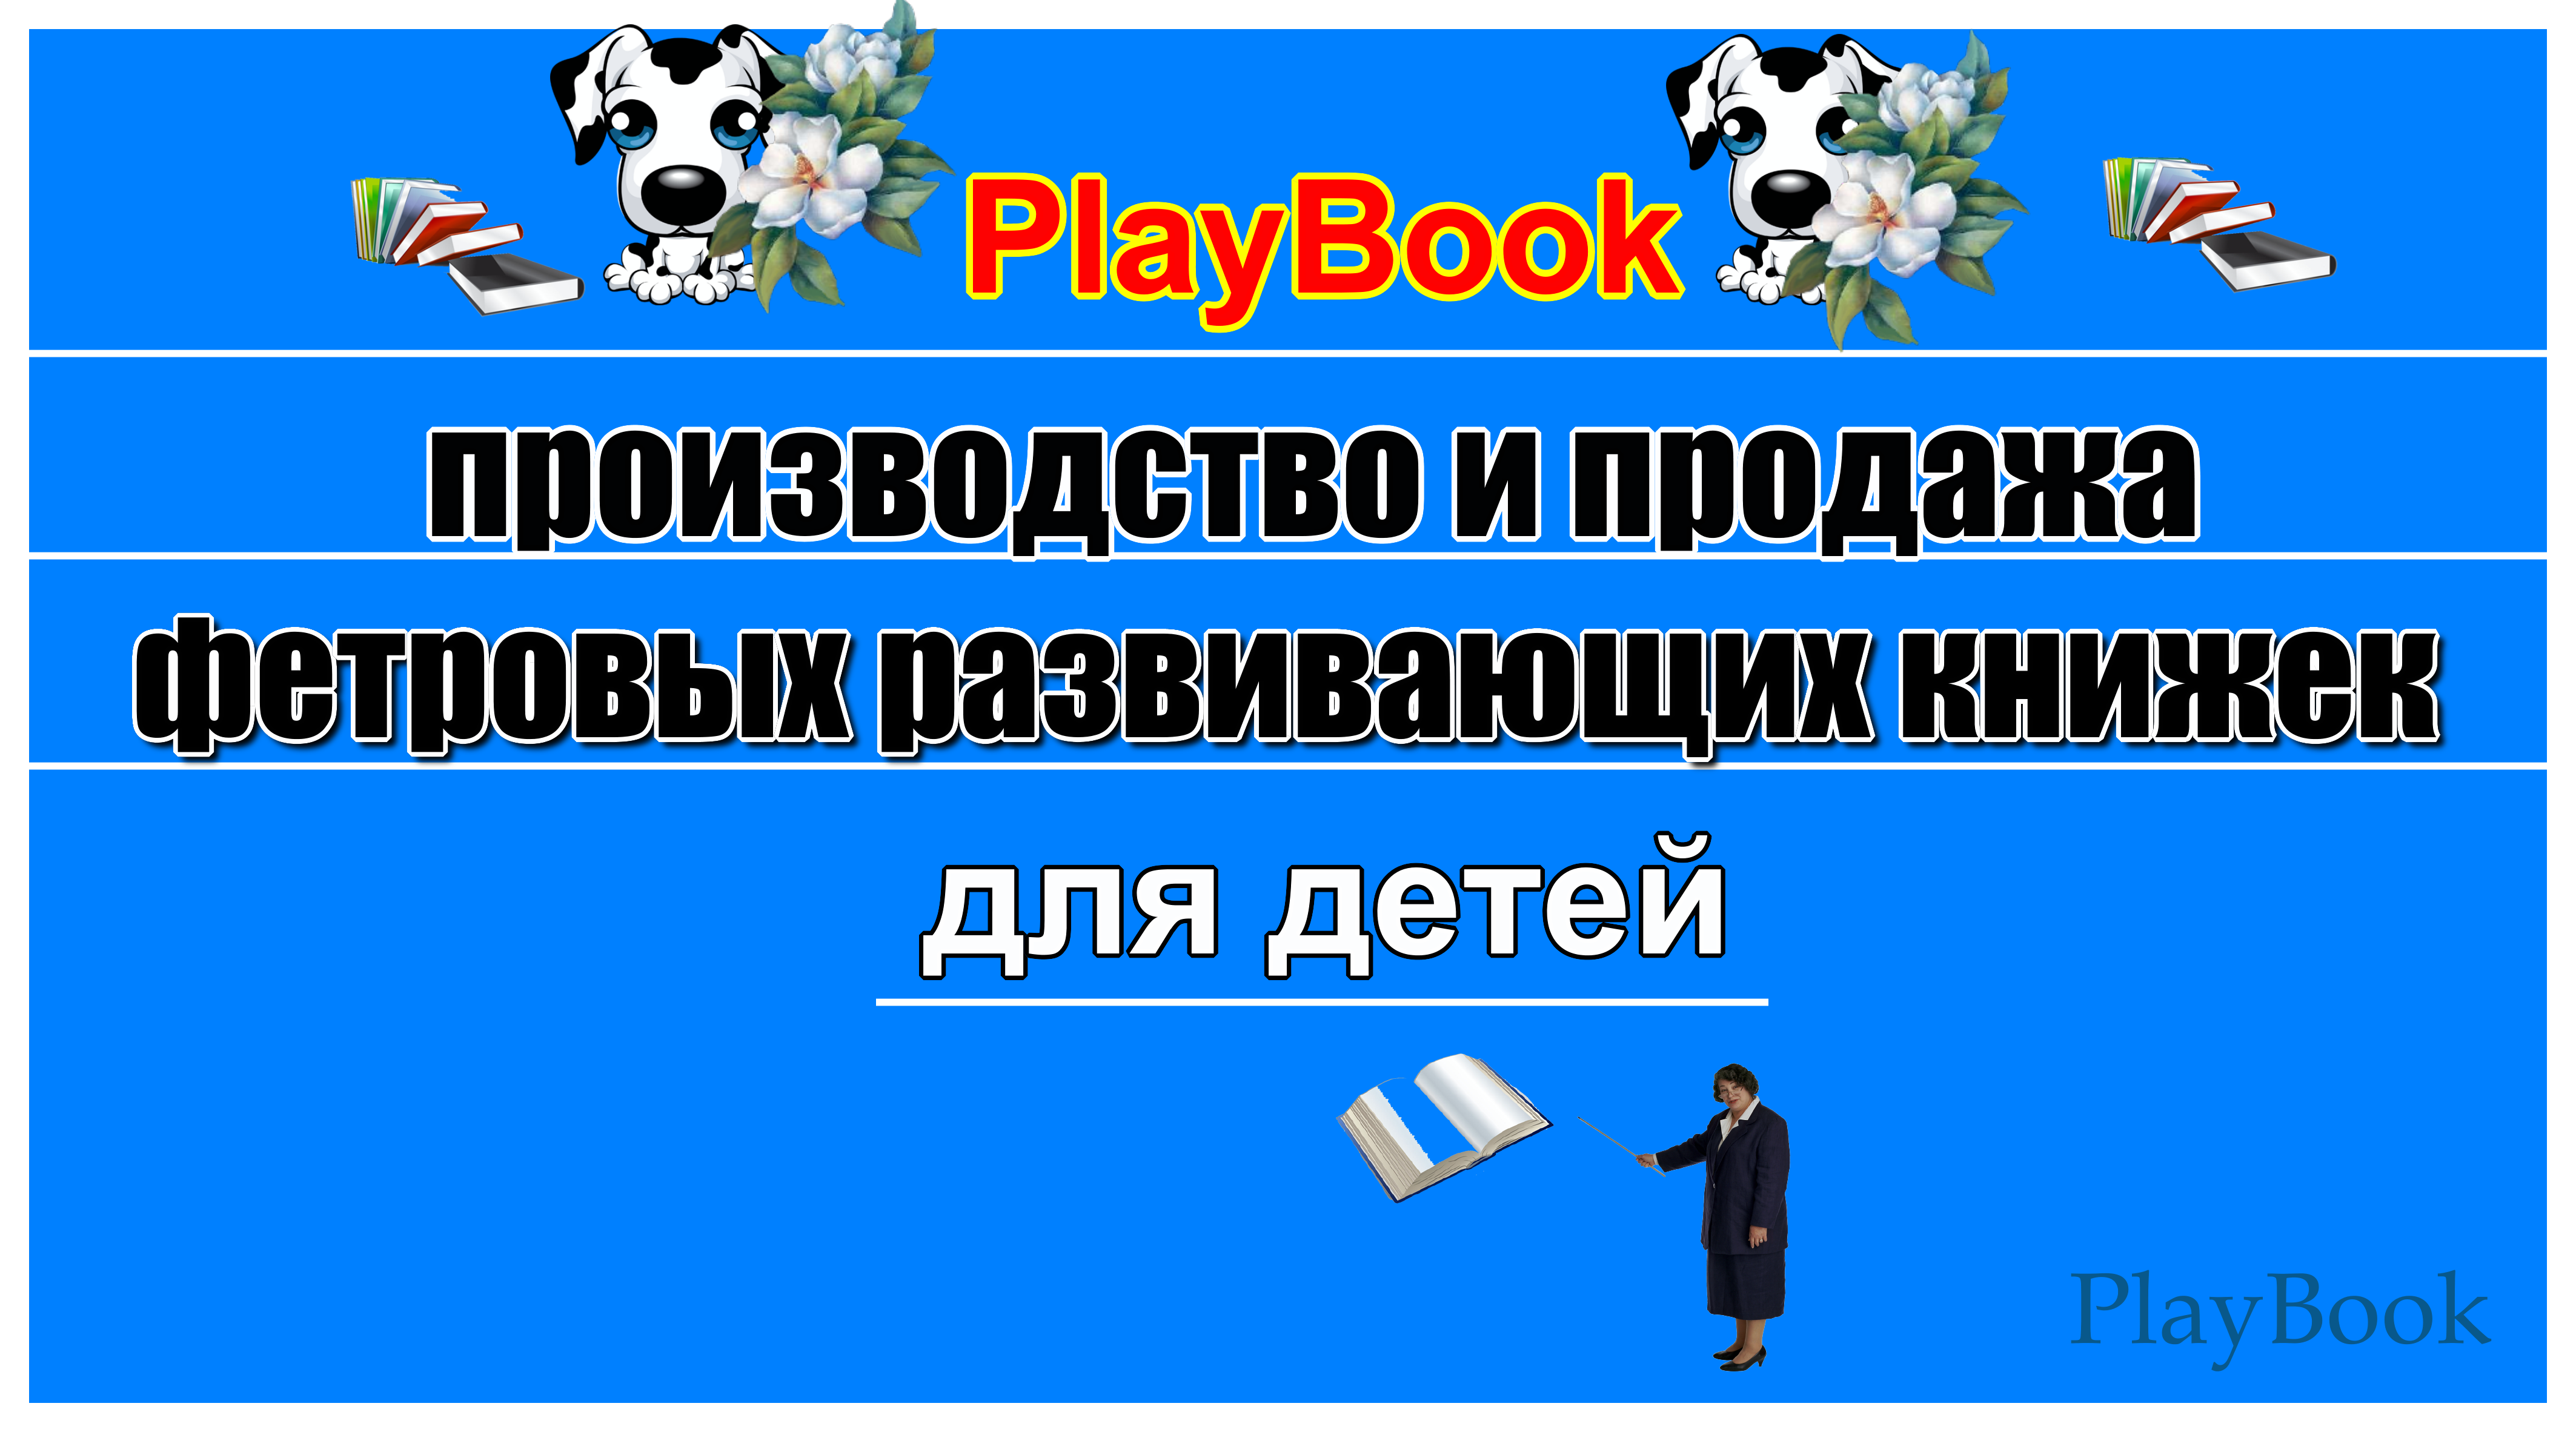 .png+%D0%BB%D0%BE%D0%B3%D0%BE%D1%82%D0%B8%D0%BF+Pley+book.png